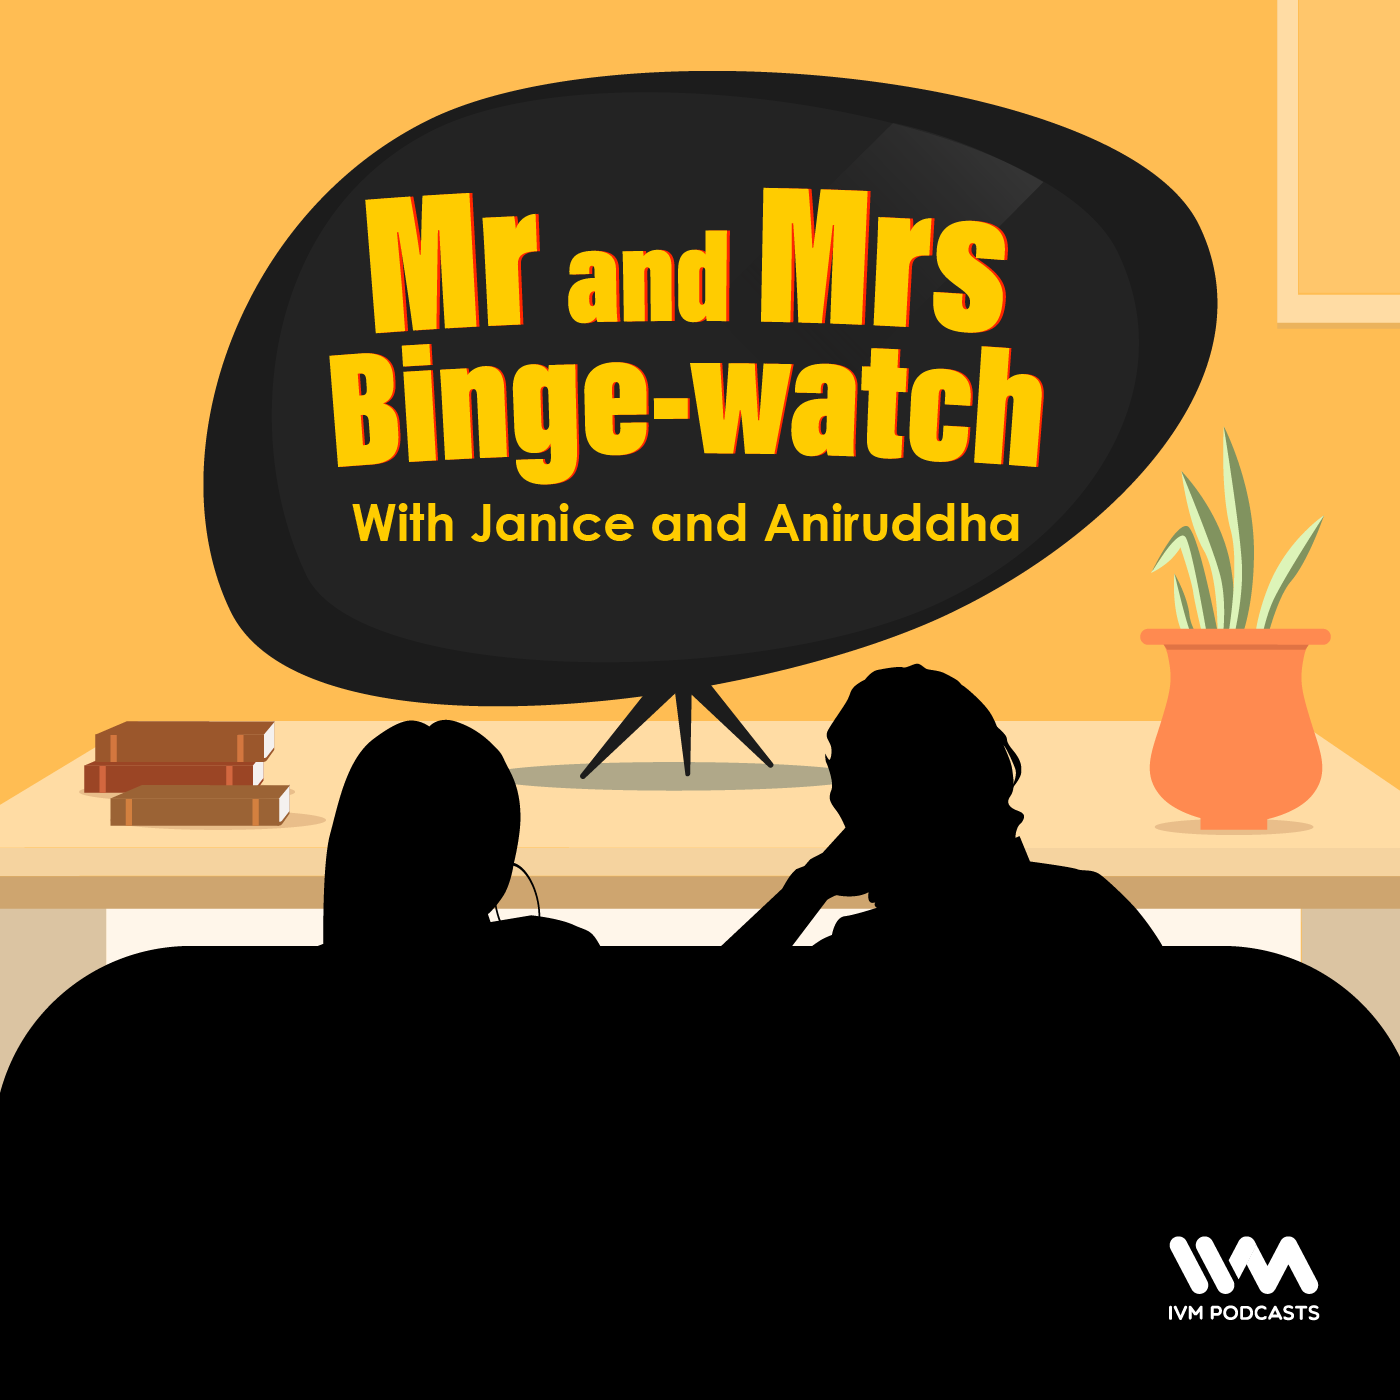 Mr and Mrs Binge-Watch |